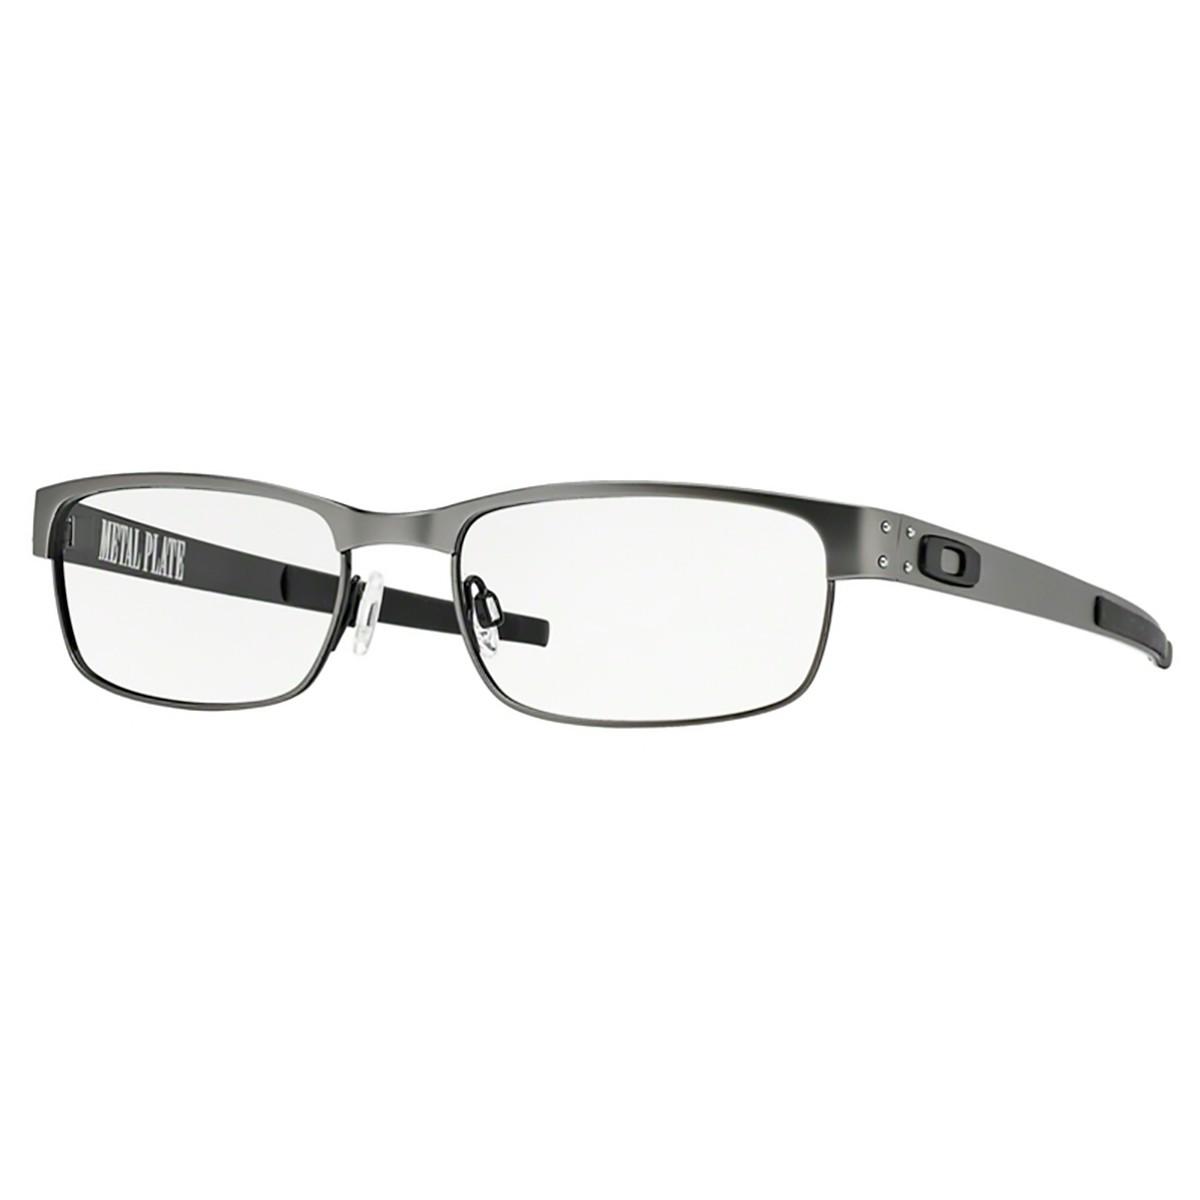 Compre Óculos de Grau Oakley Metal Plate em 10X   Tri-Jóia Shop ce42c56c50